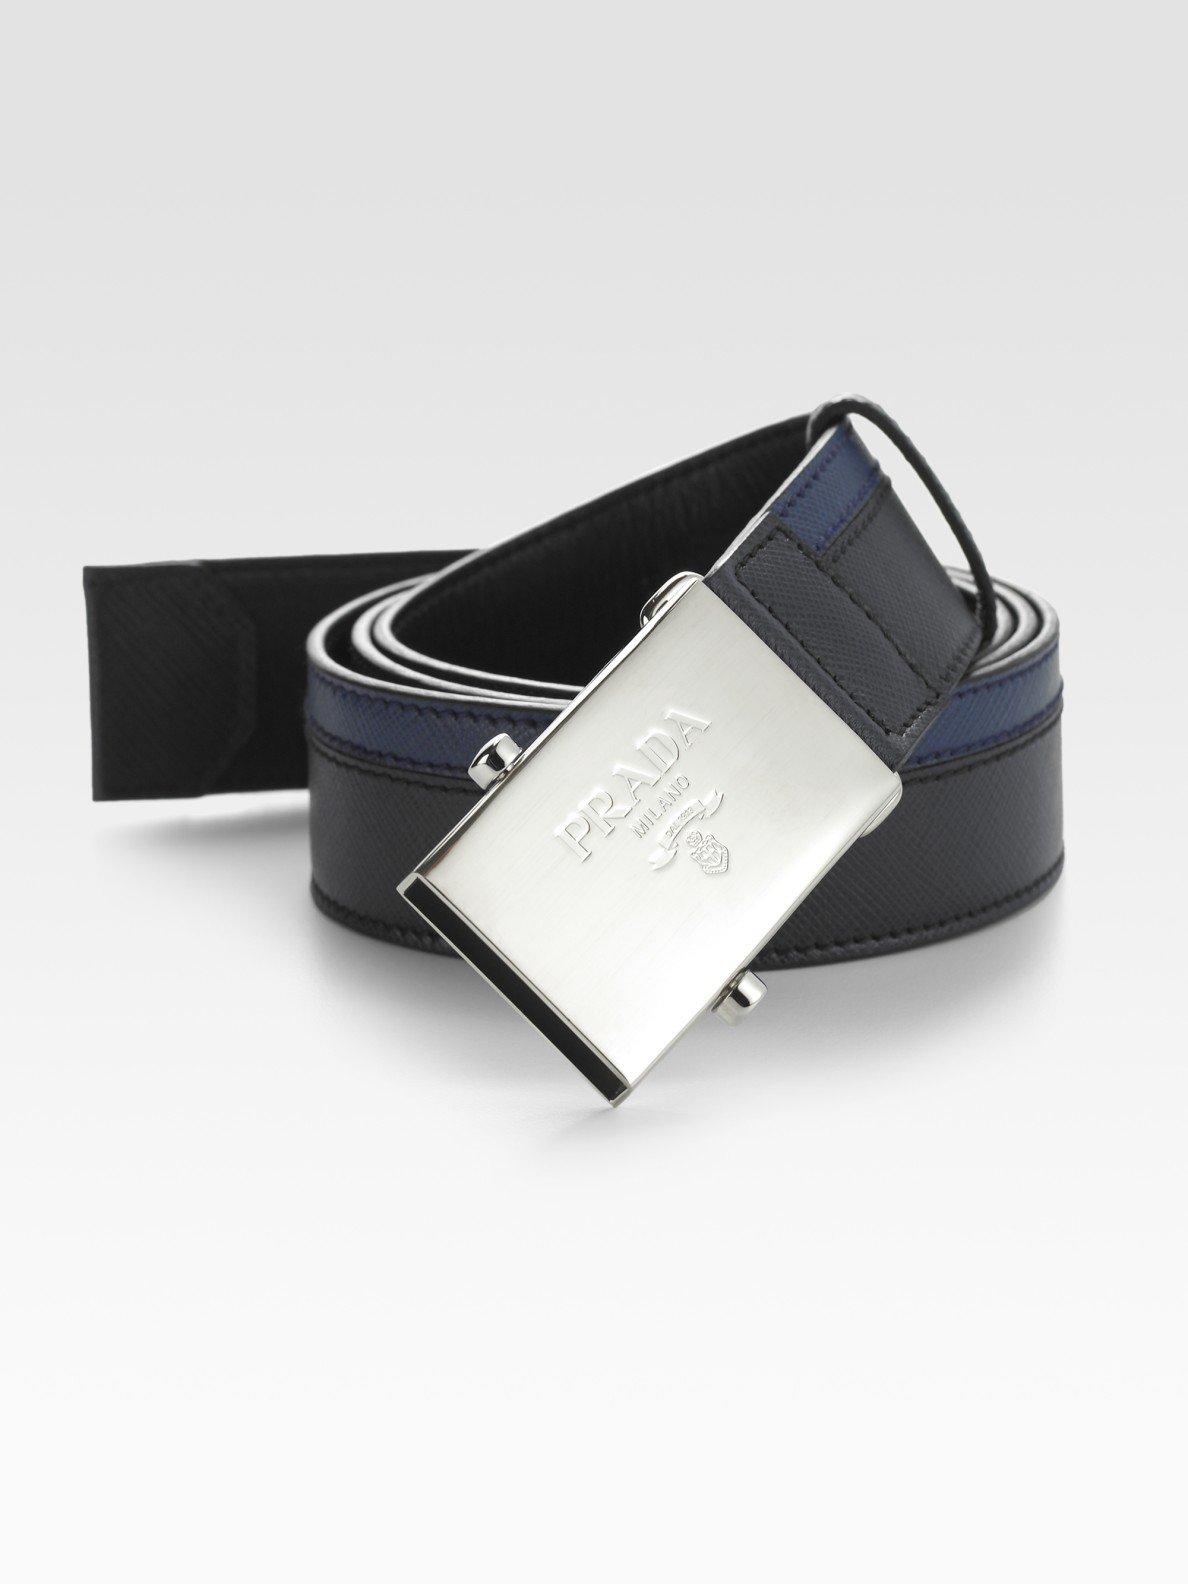 prada handbags and purses - Prada Saffiano Striped Leather Belt in Blue for Men | Lyst